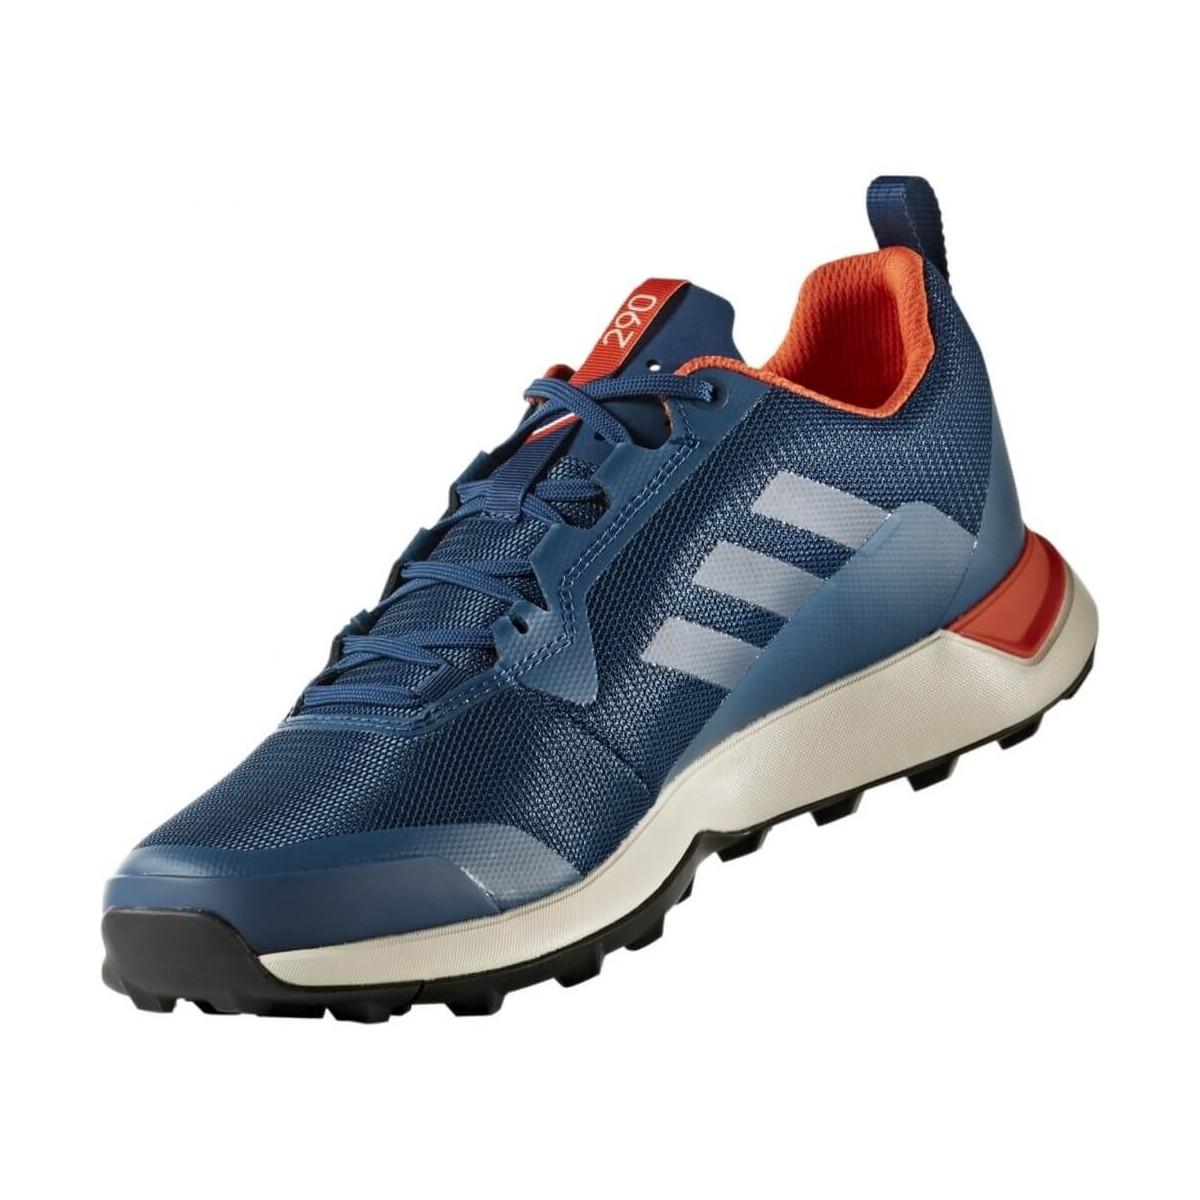 093bb465 Zapatillas Adidas Trail Terrex CMTK OI17 azul - 365 Rider